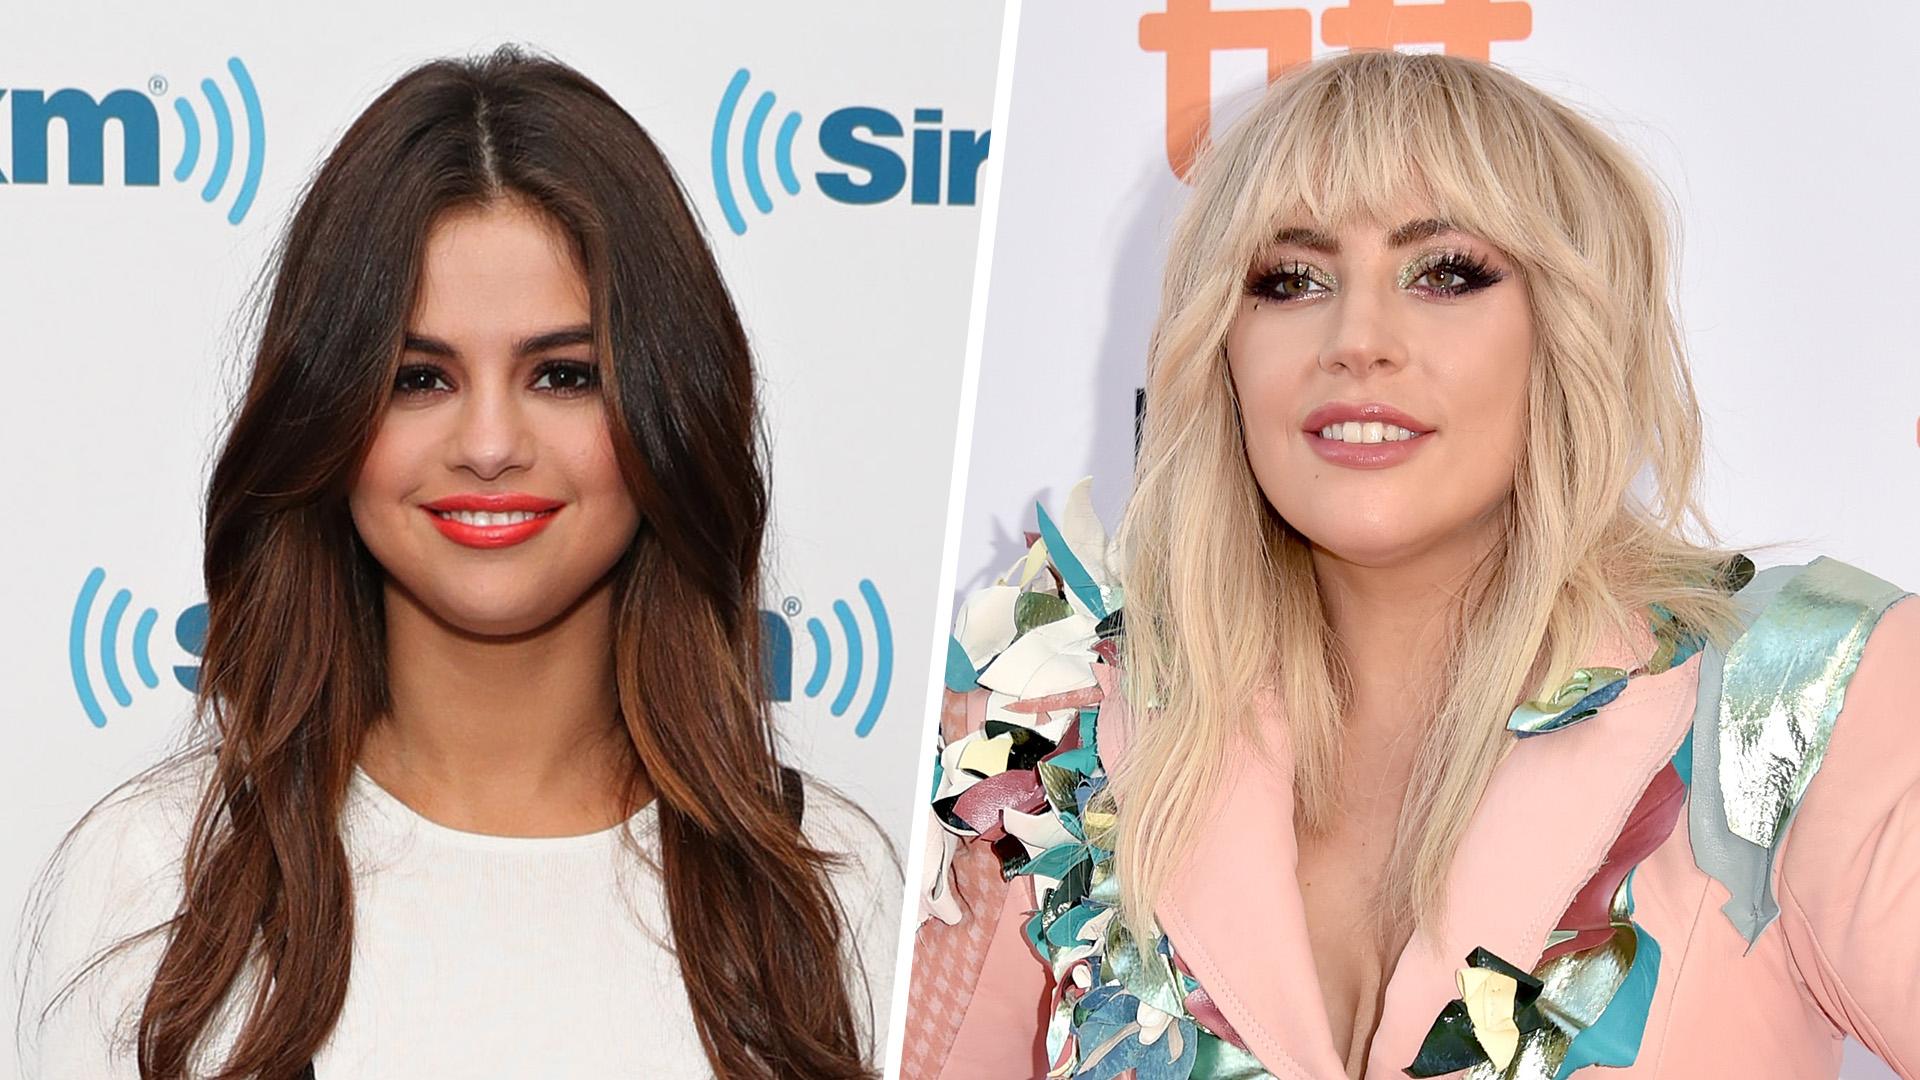 Diseases Of The Celebrities